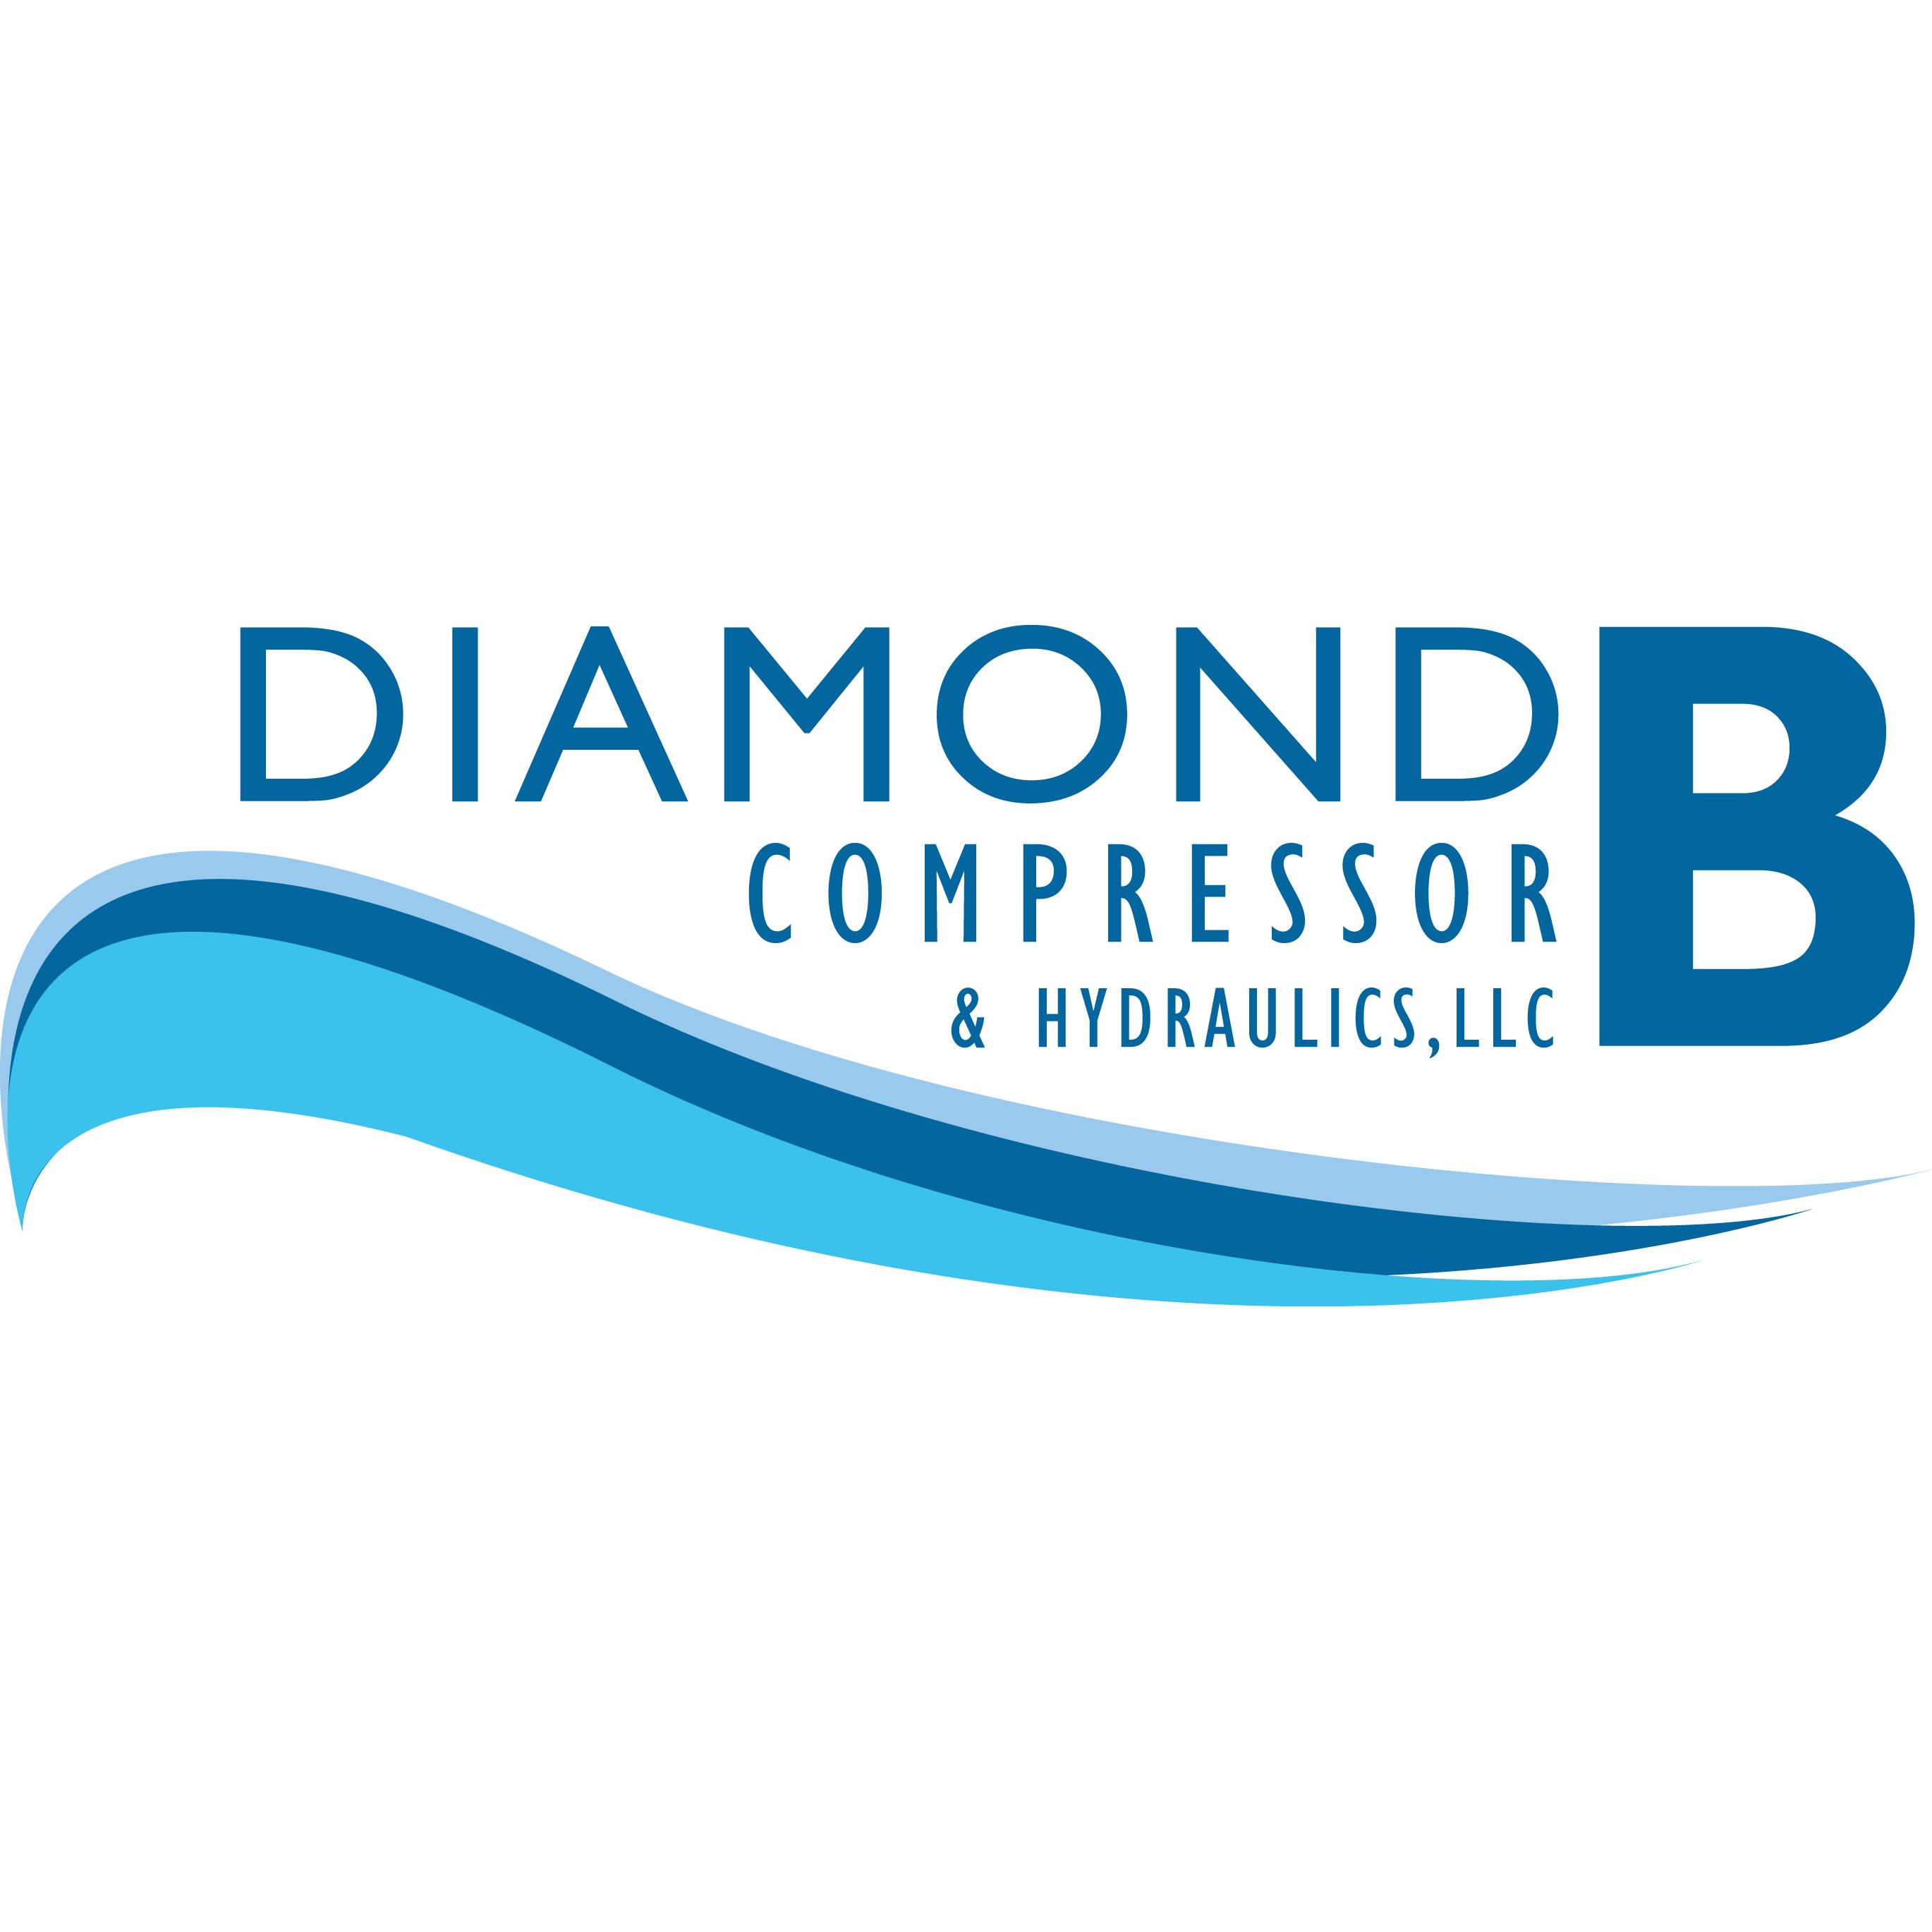 Diamond B Compressor & Hydraulics, LLC